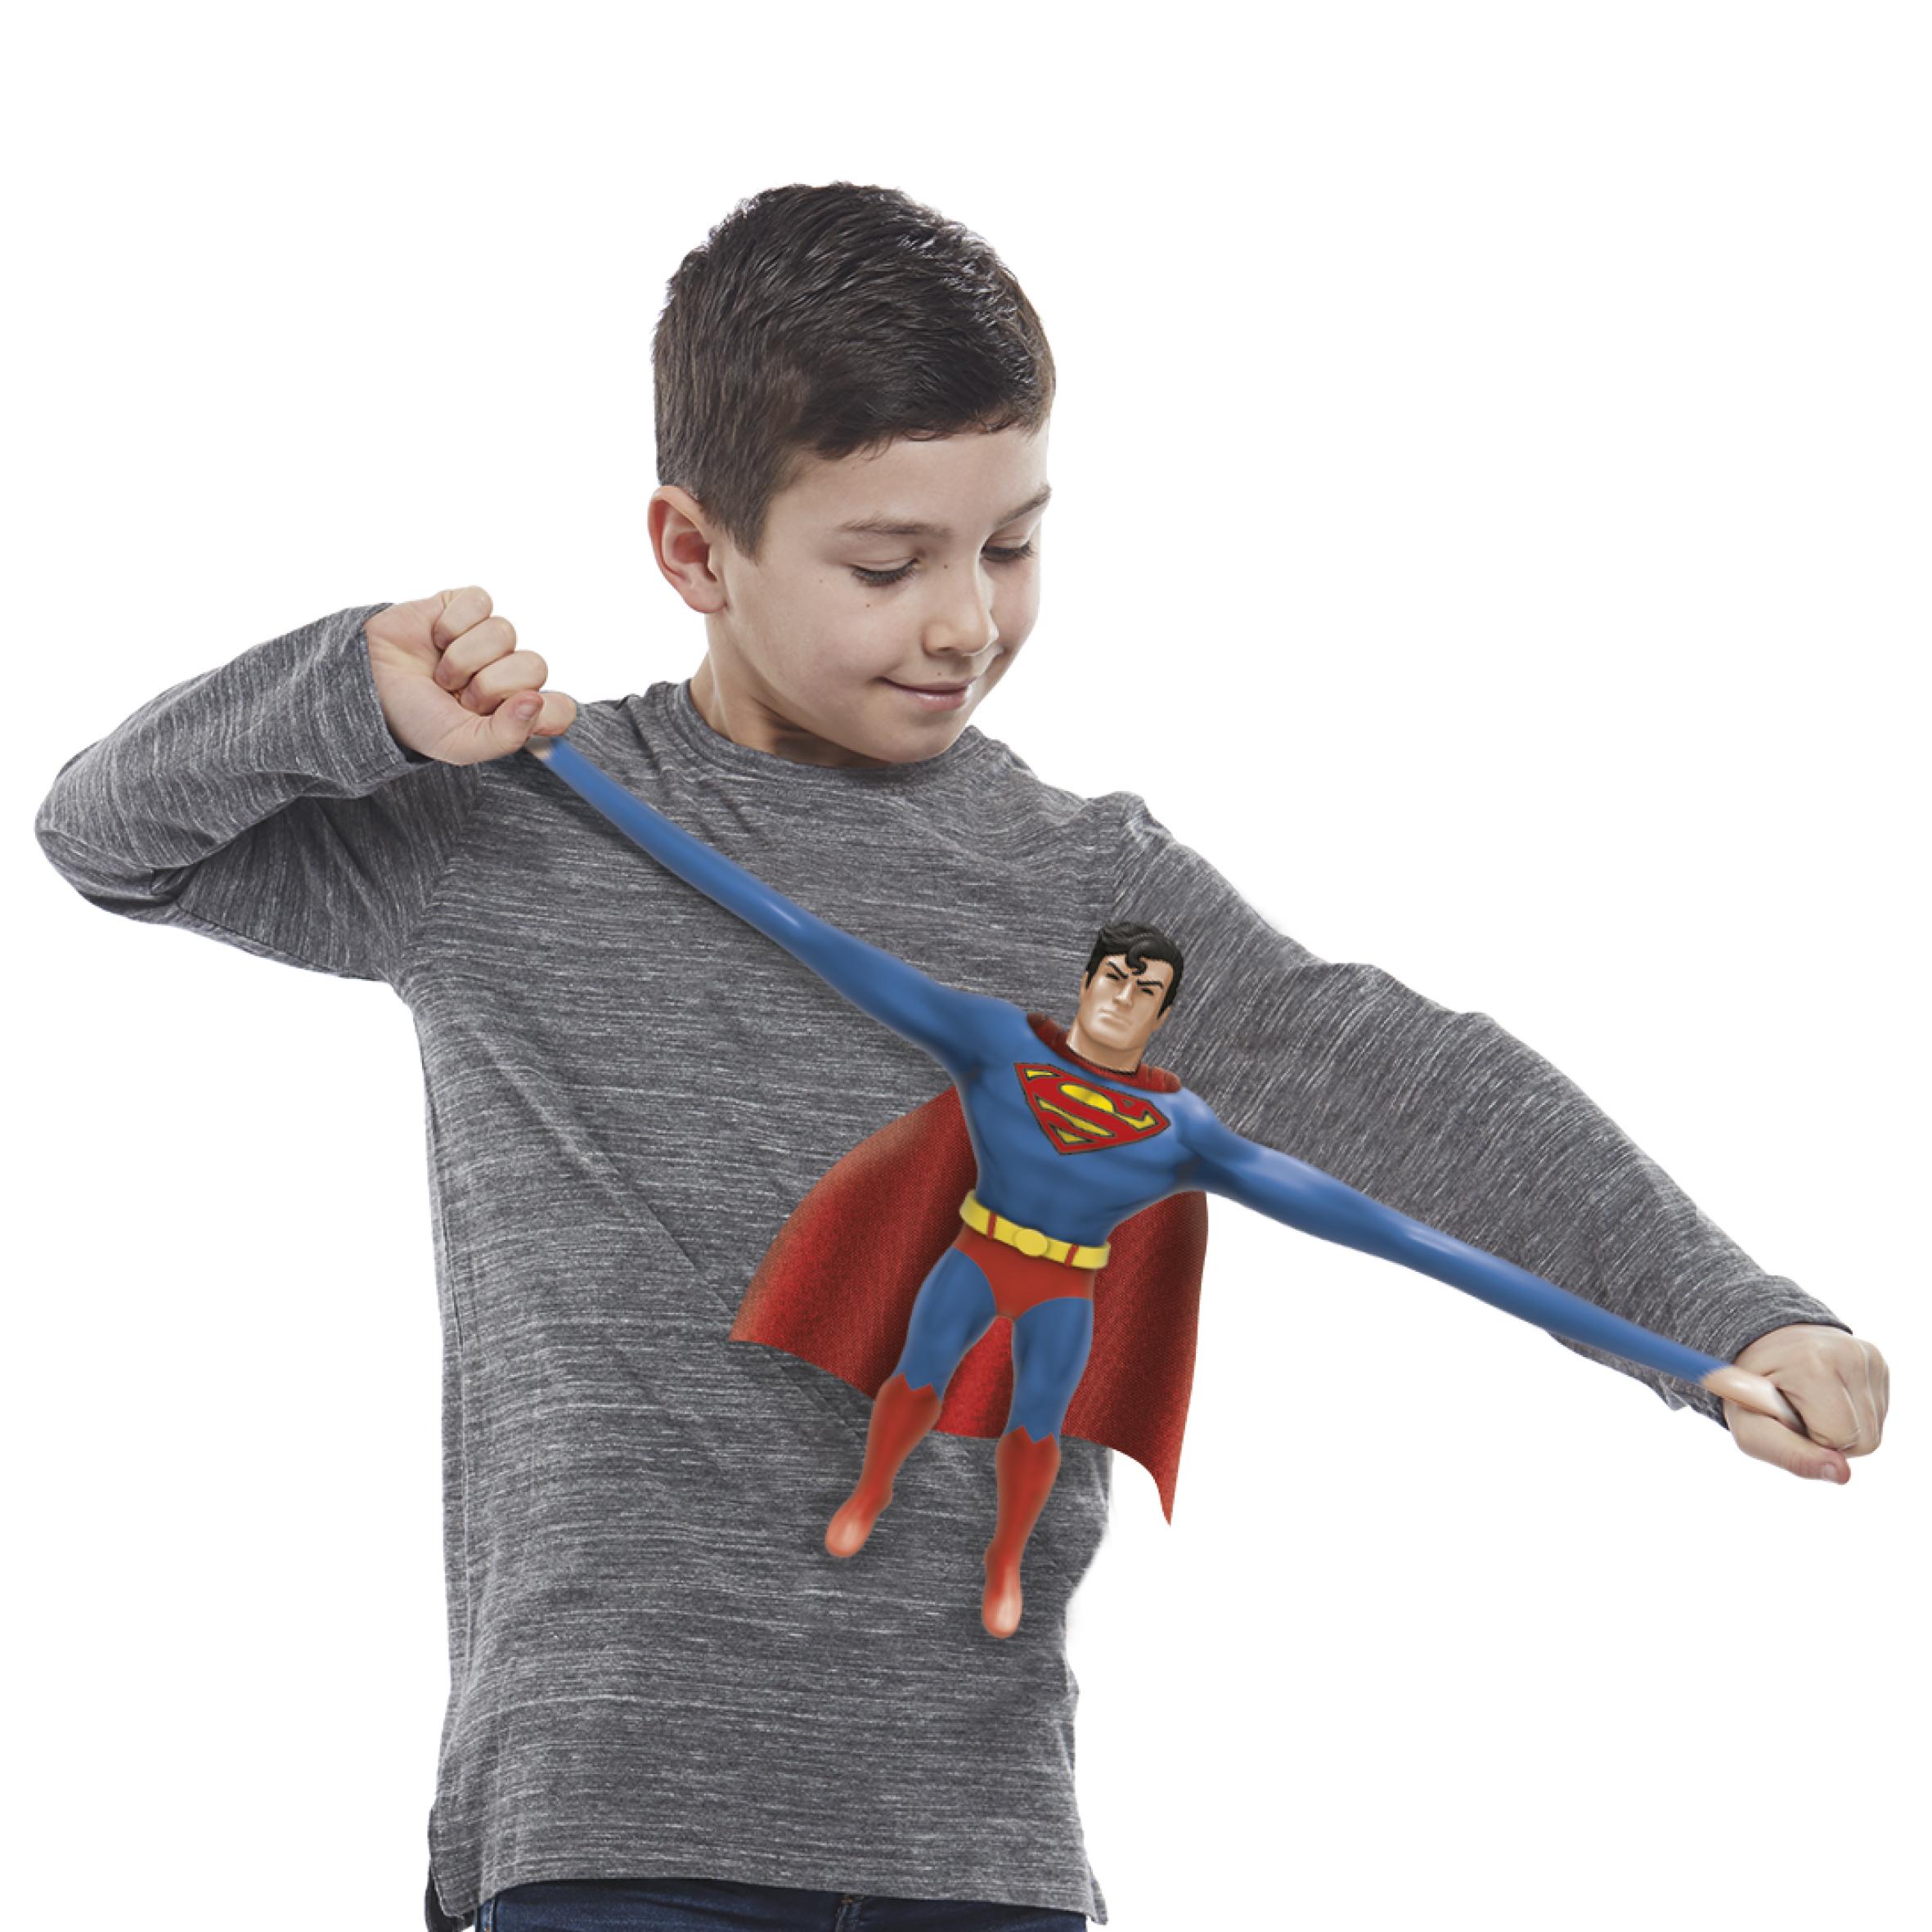 CHARACTER STRETCH Veniv Superman 25 cm figuur